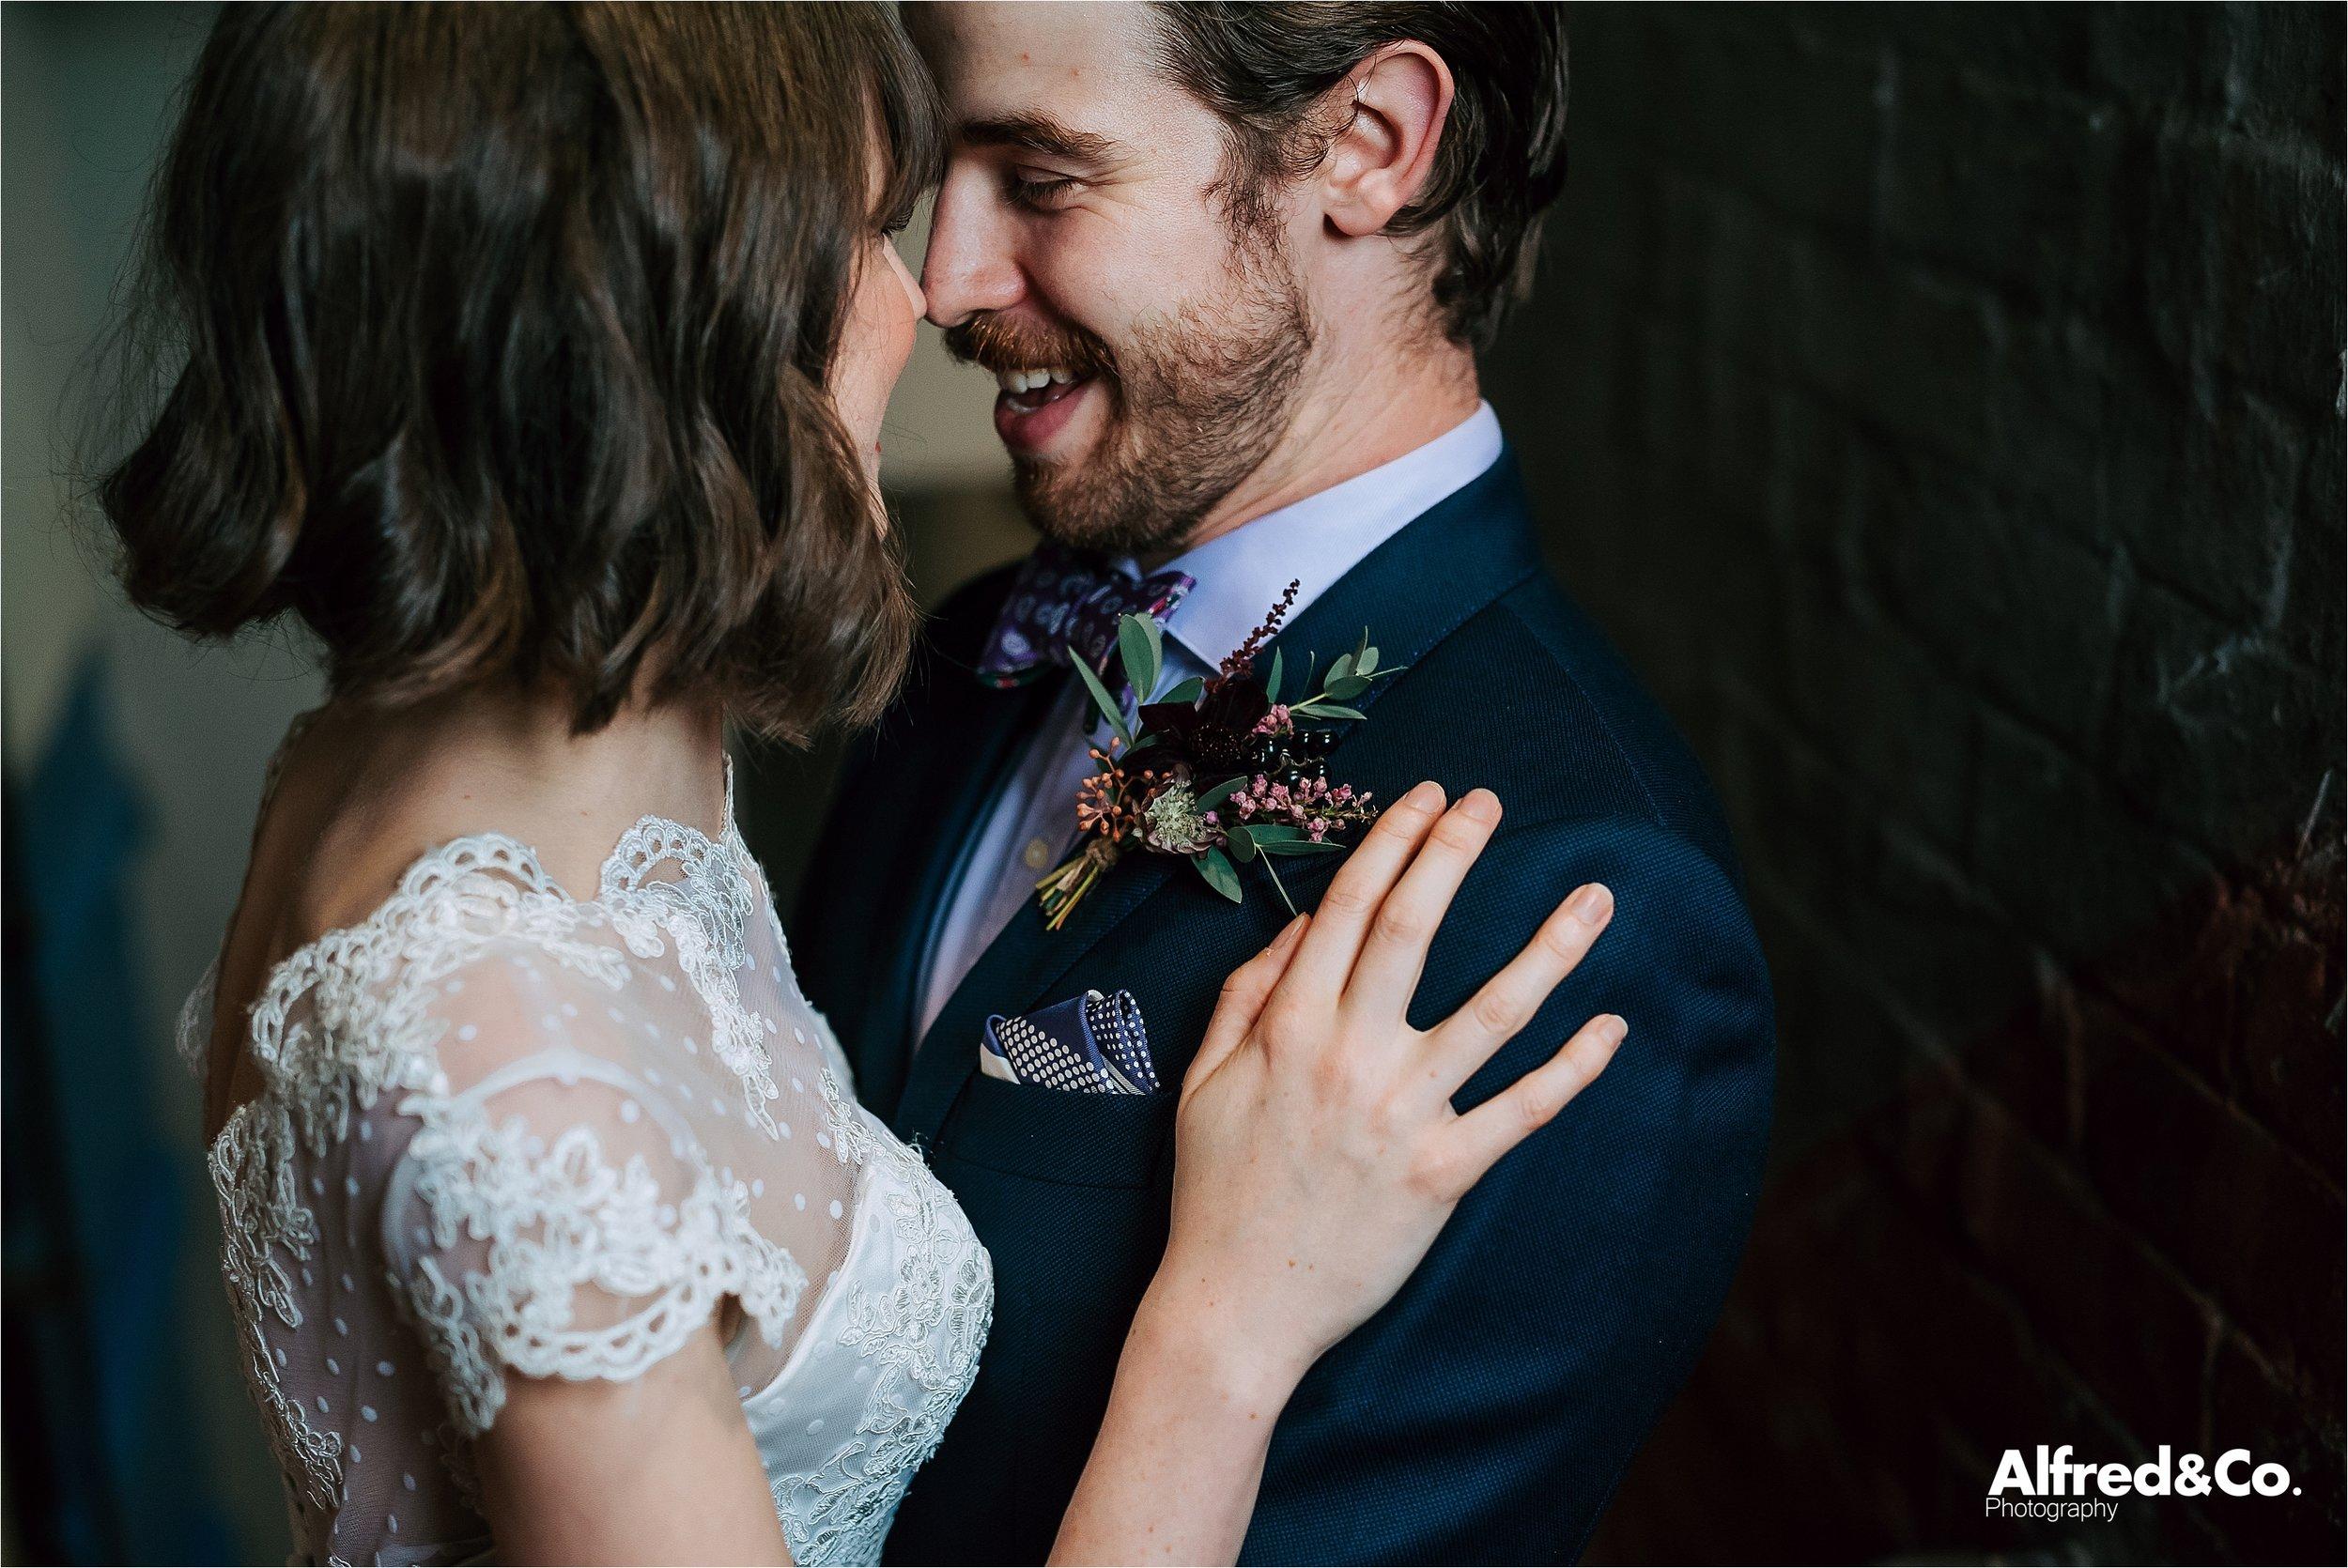 cute couple in rustic wedding venue